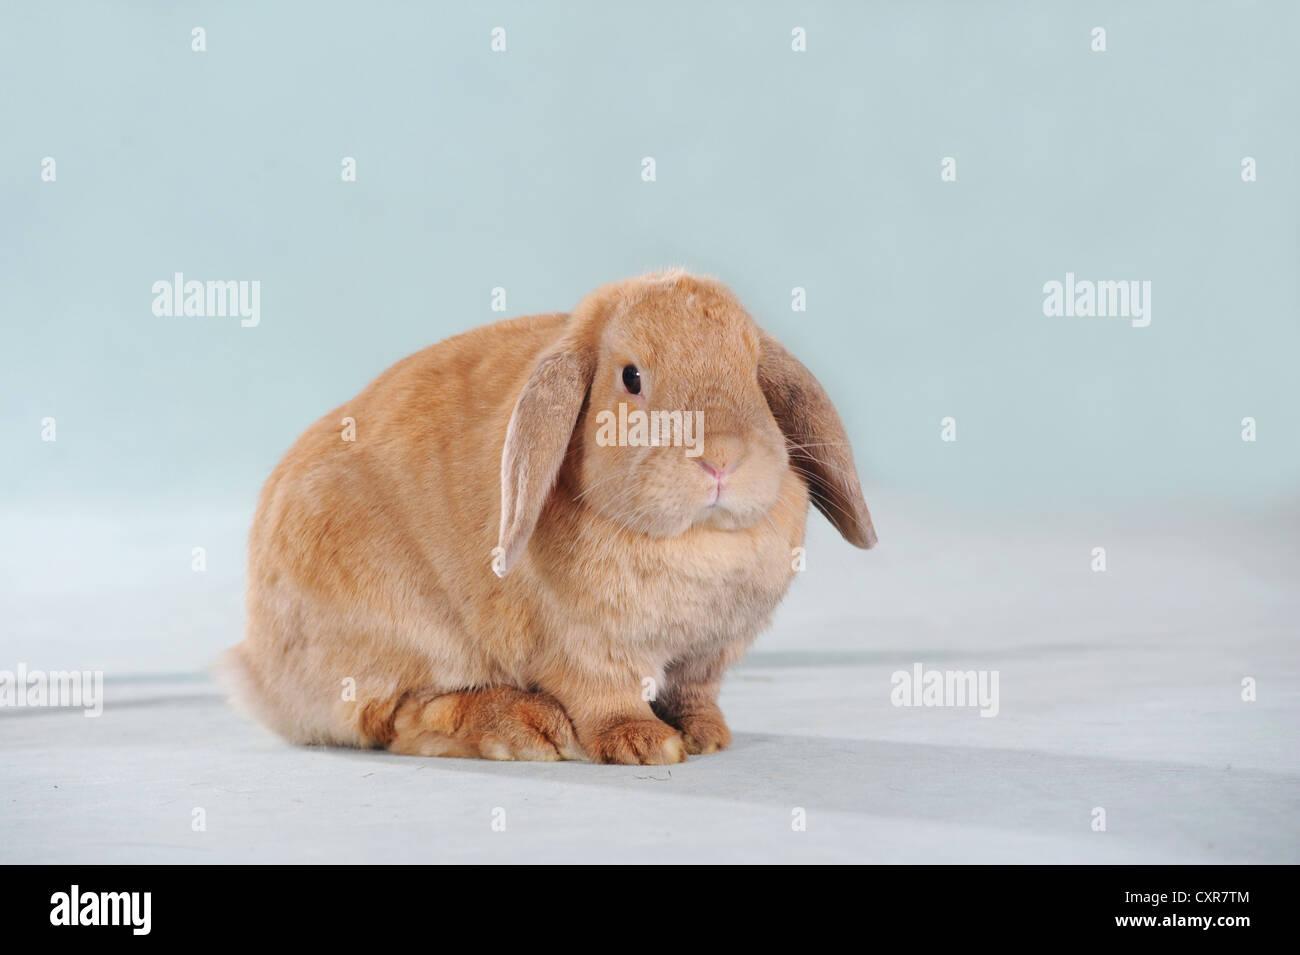 Brown long eared rabbit - Stock Image